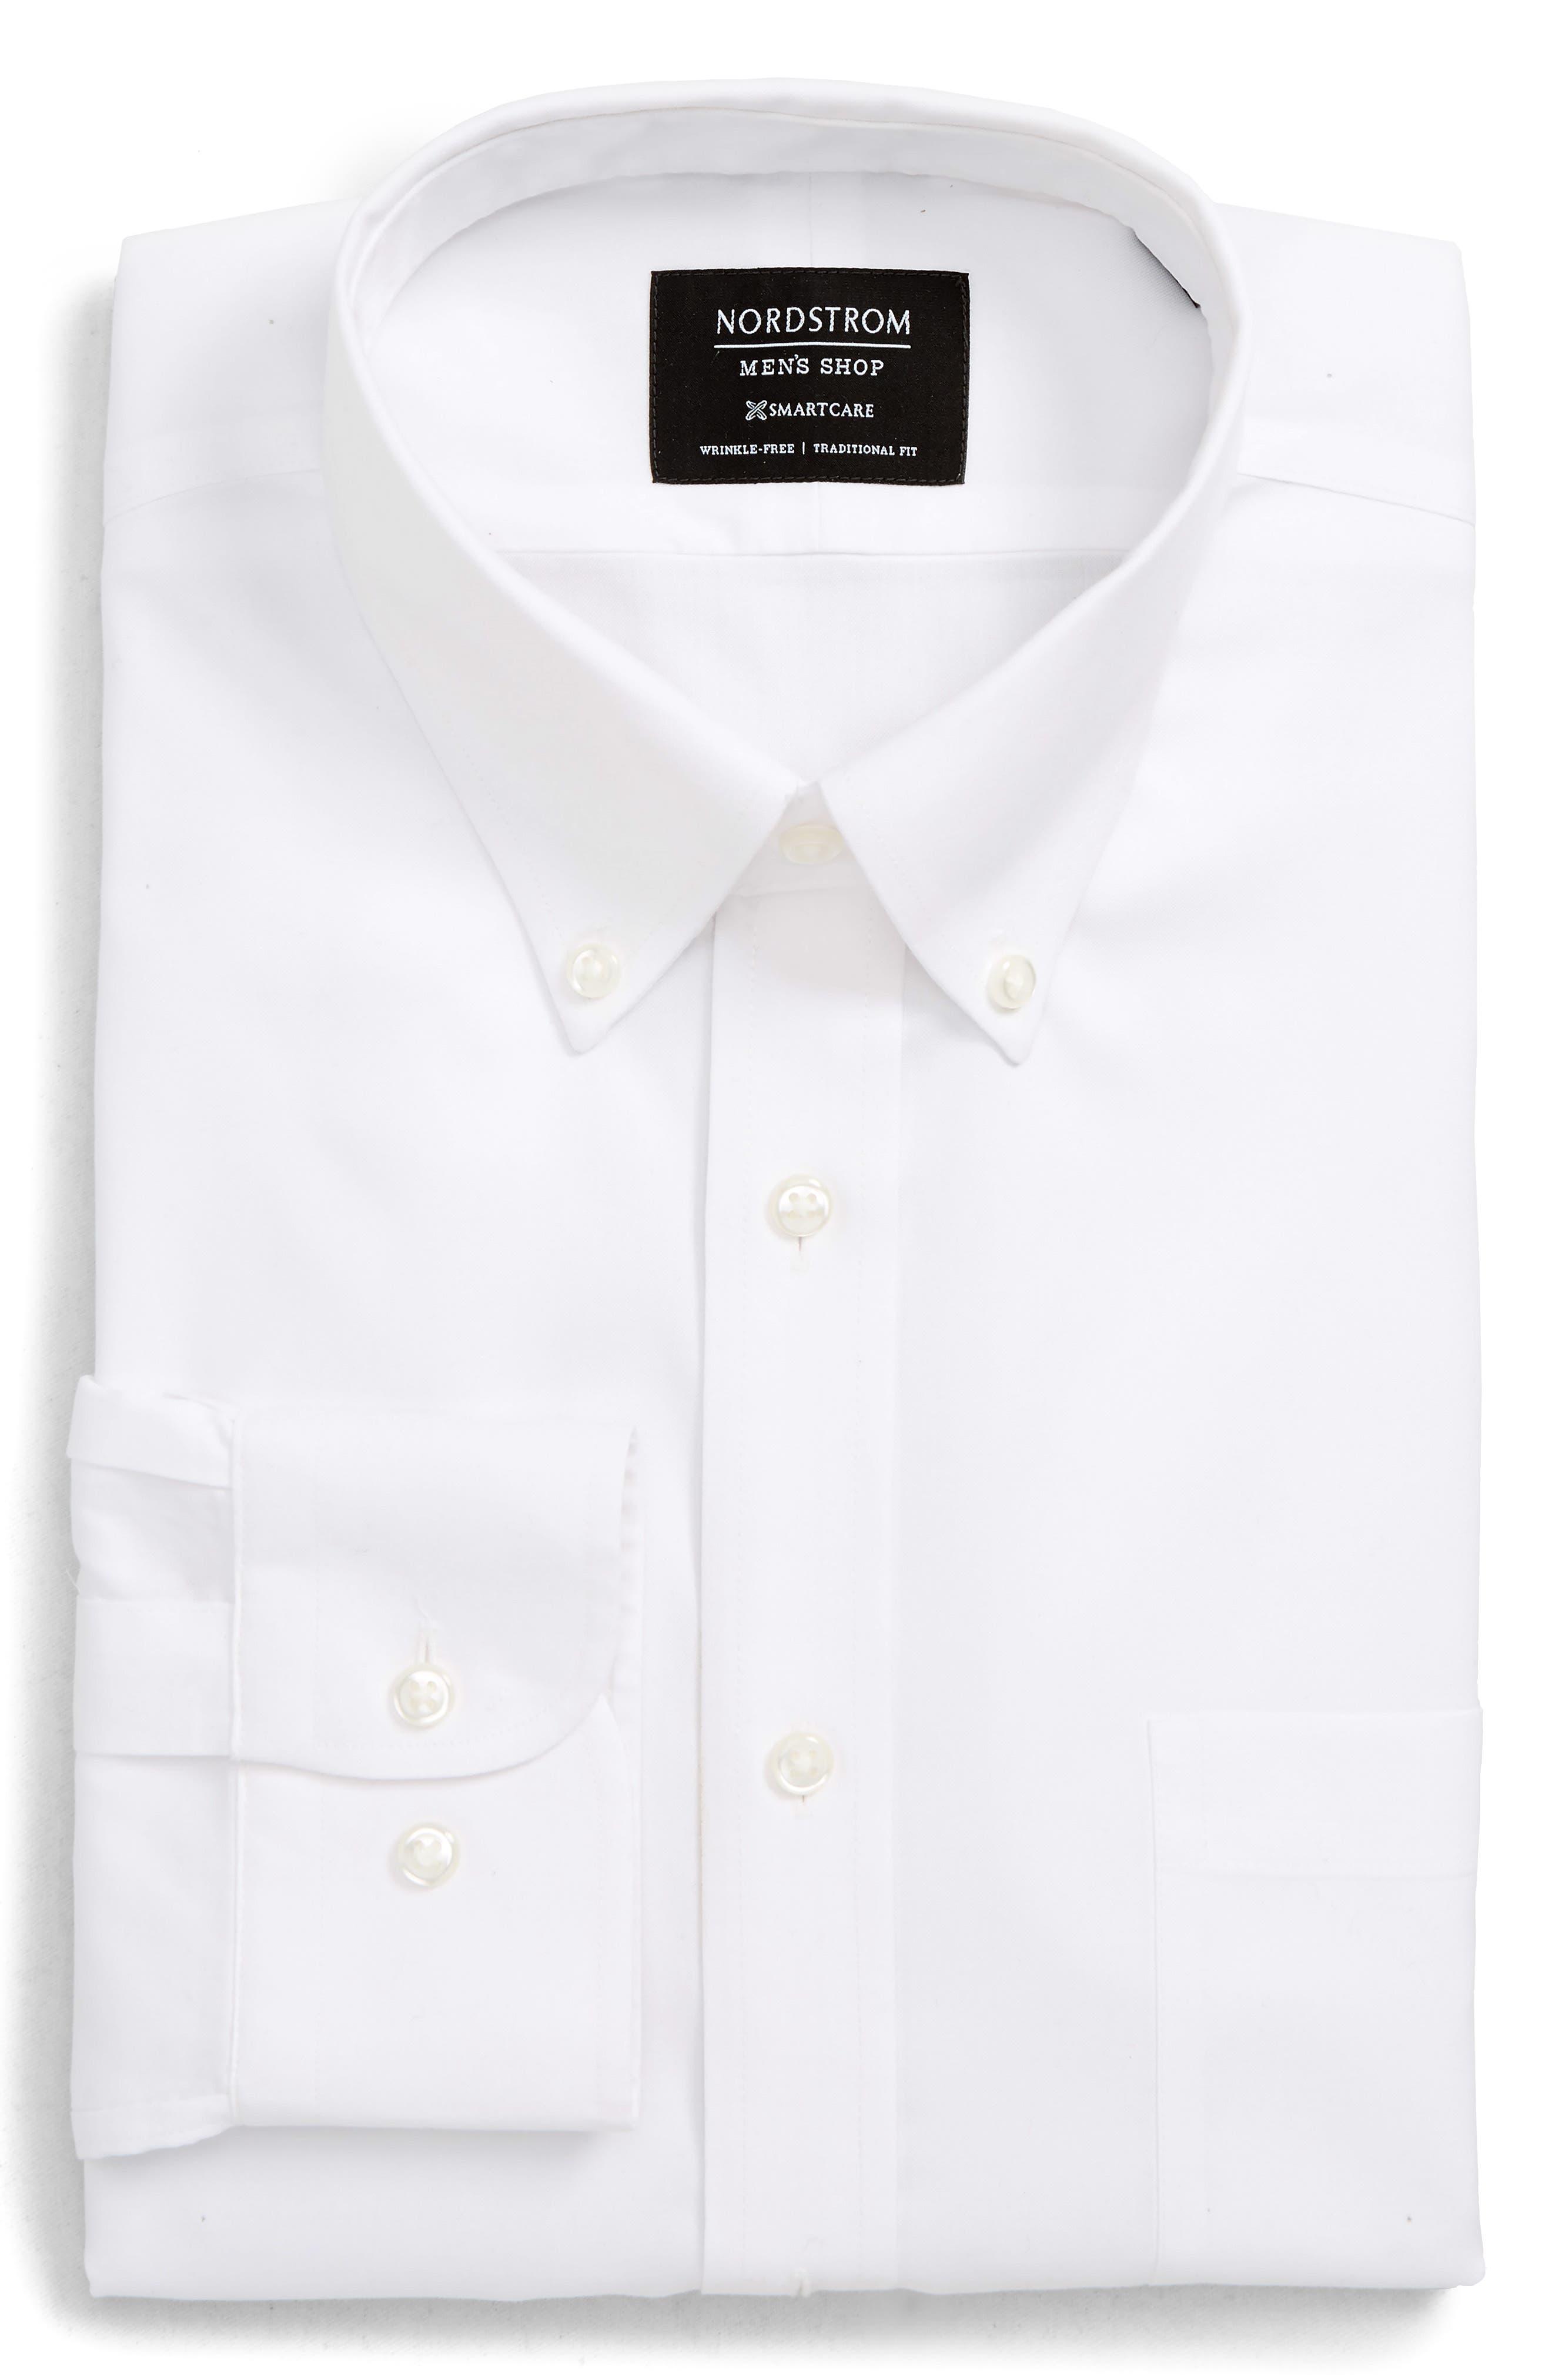 Nordstrom Shop Smartcare(TM) Traditional Fit Pinpoint Dress Shirt 32/33 - White